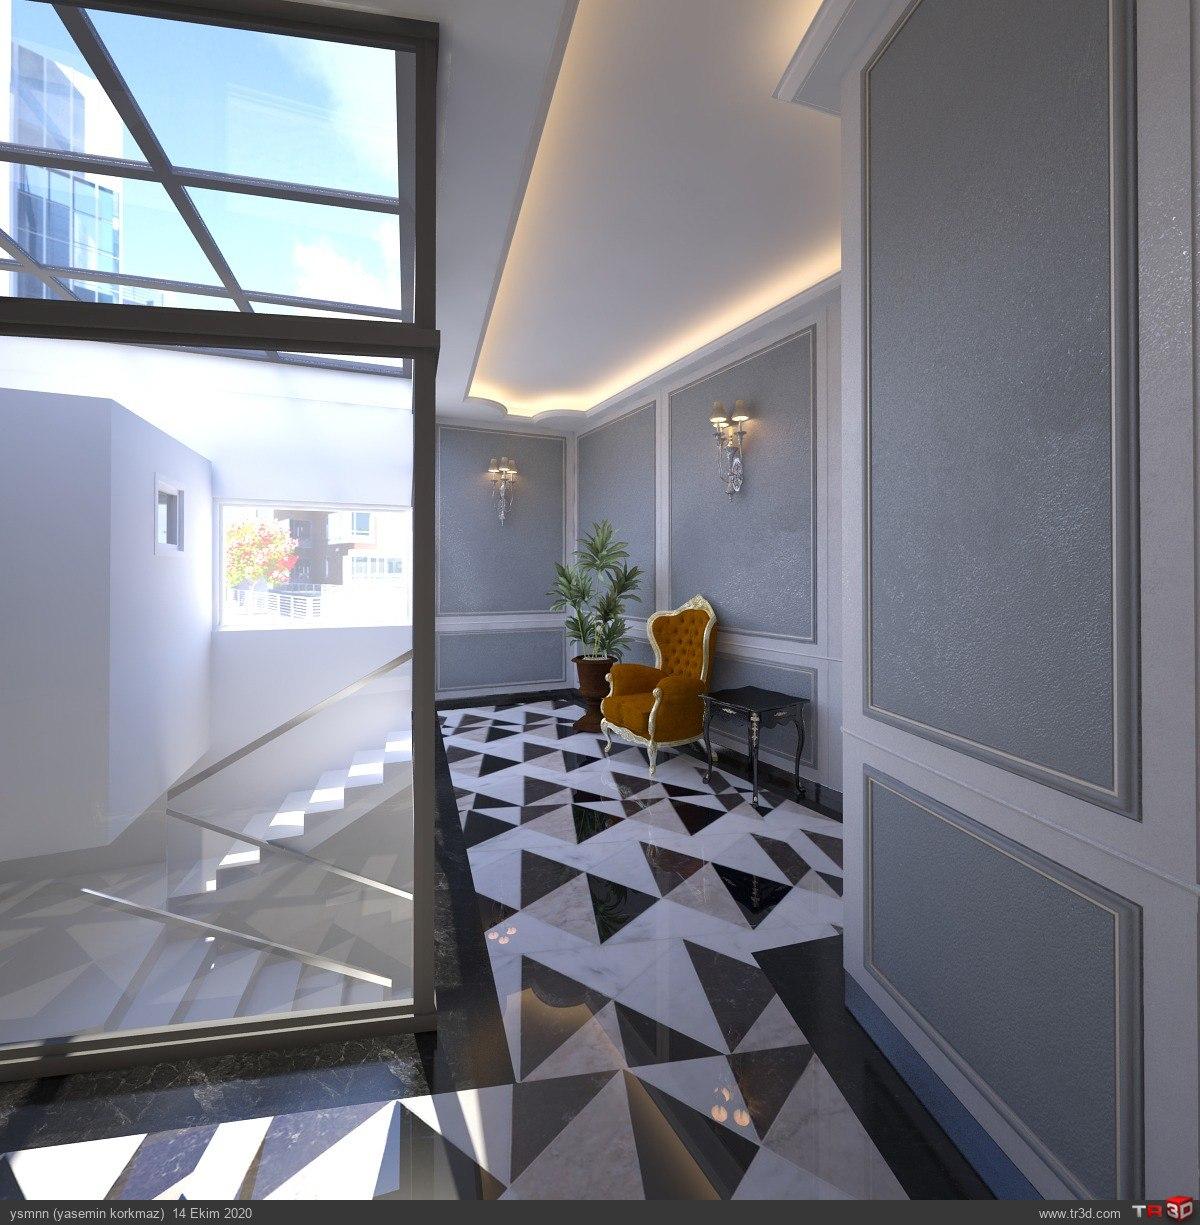 Bakü Koridor 2